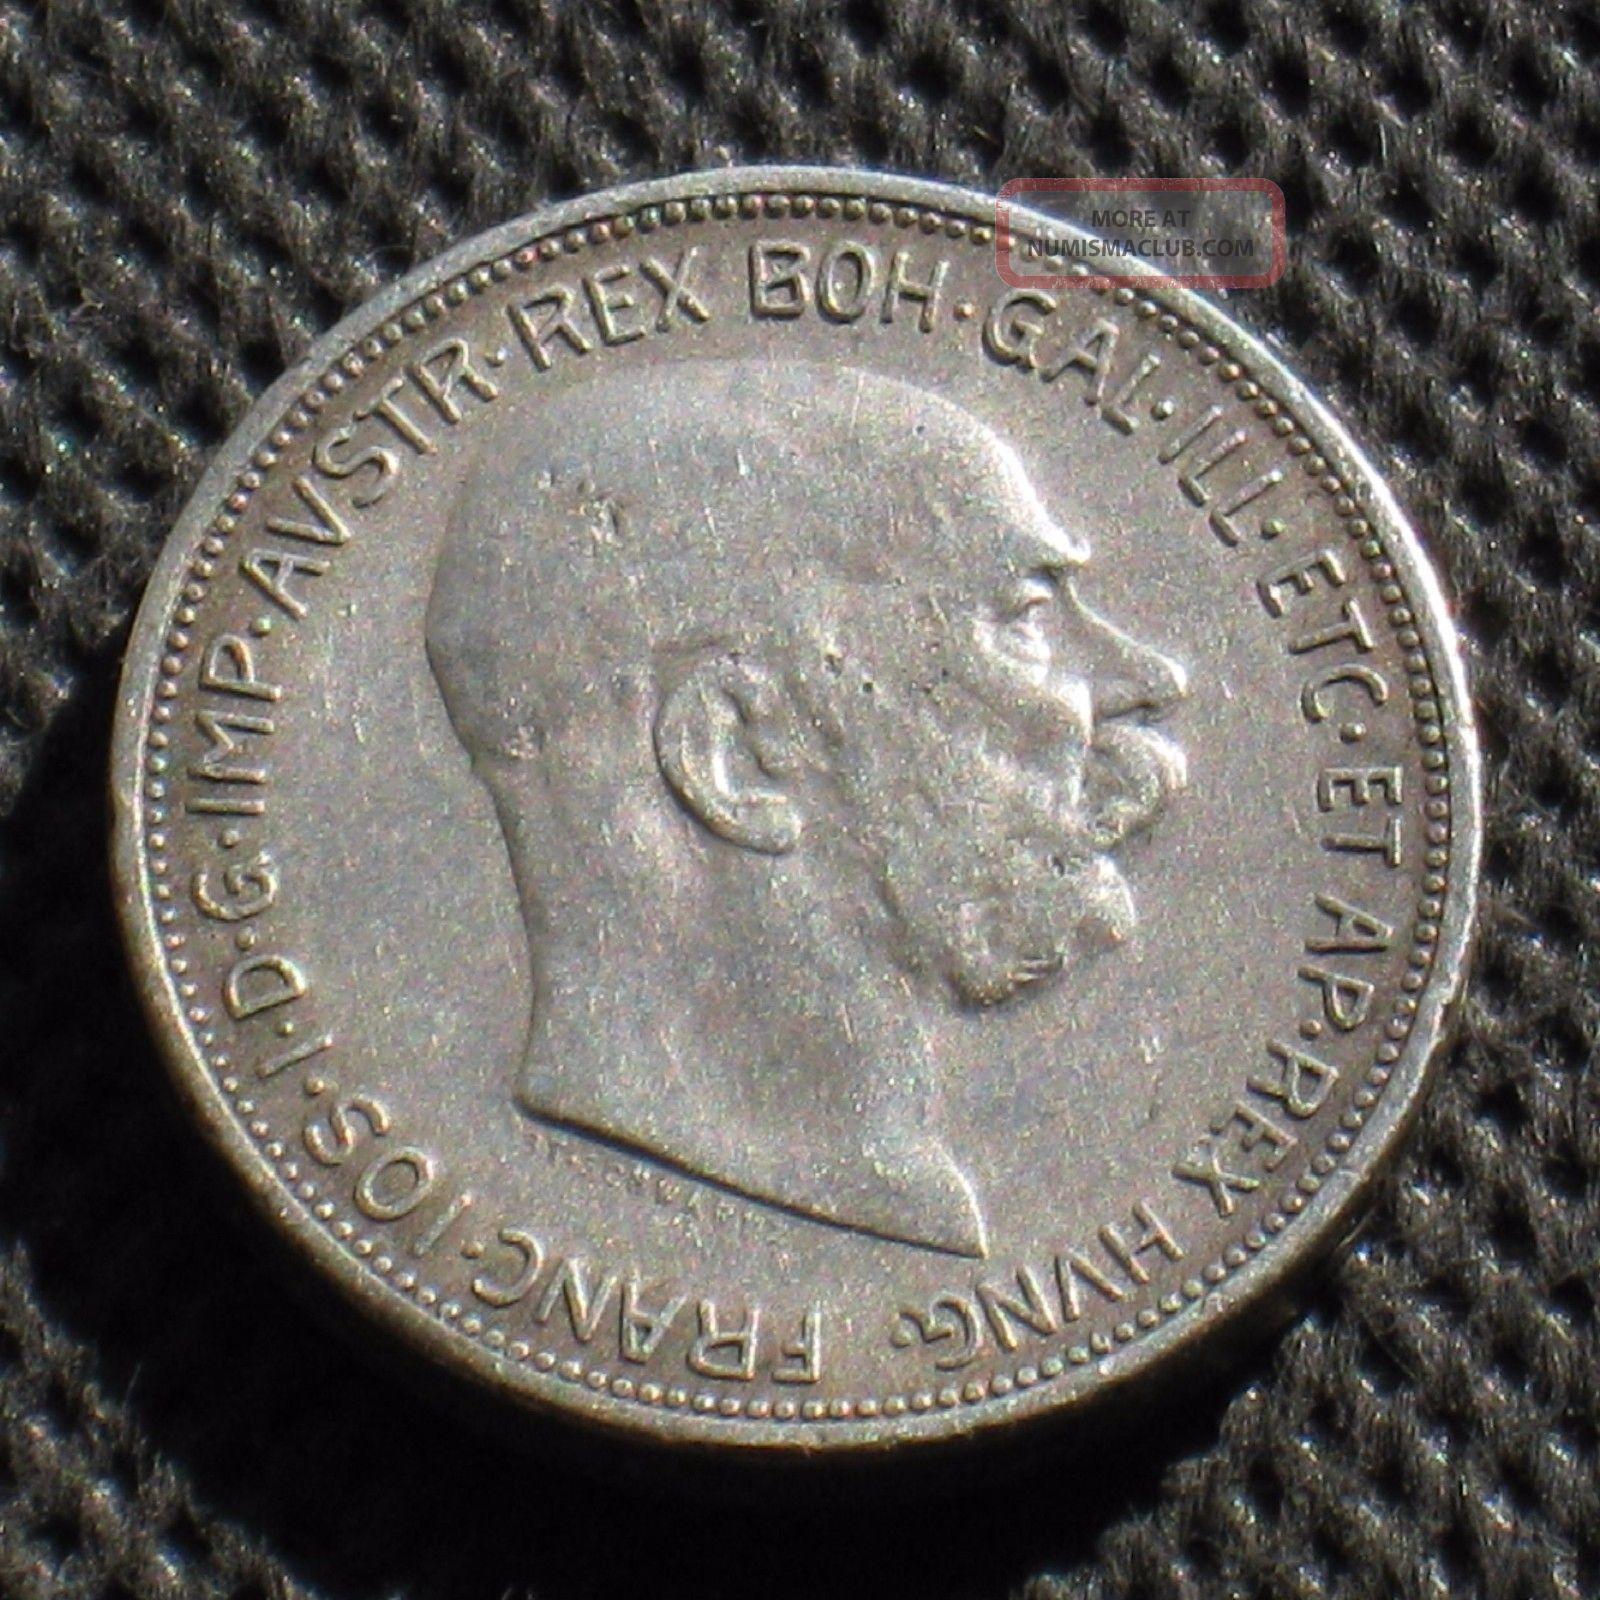 Old Silver Coin Of Austria 2 Corona 1912 Habsburg Monarchy Ag Europe photo